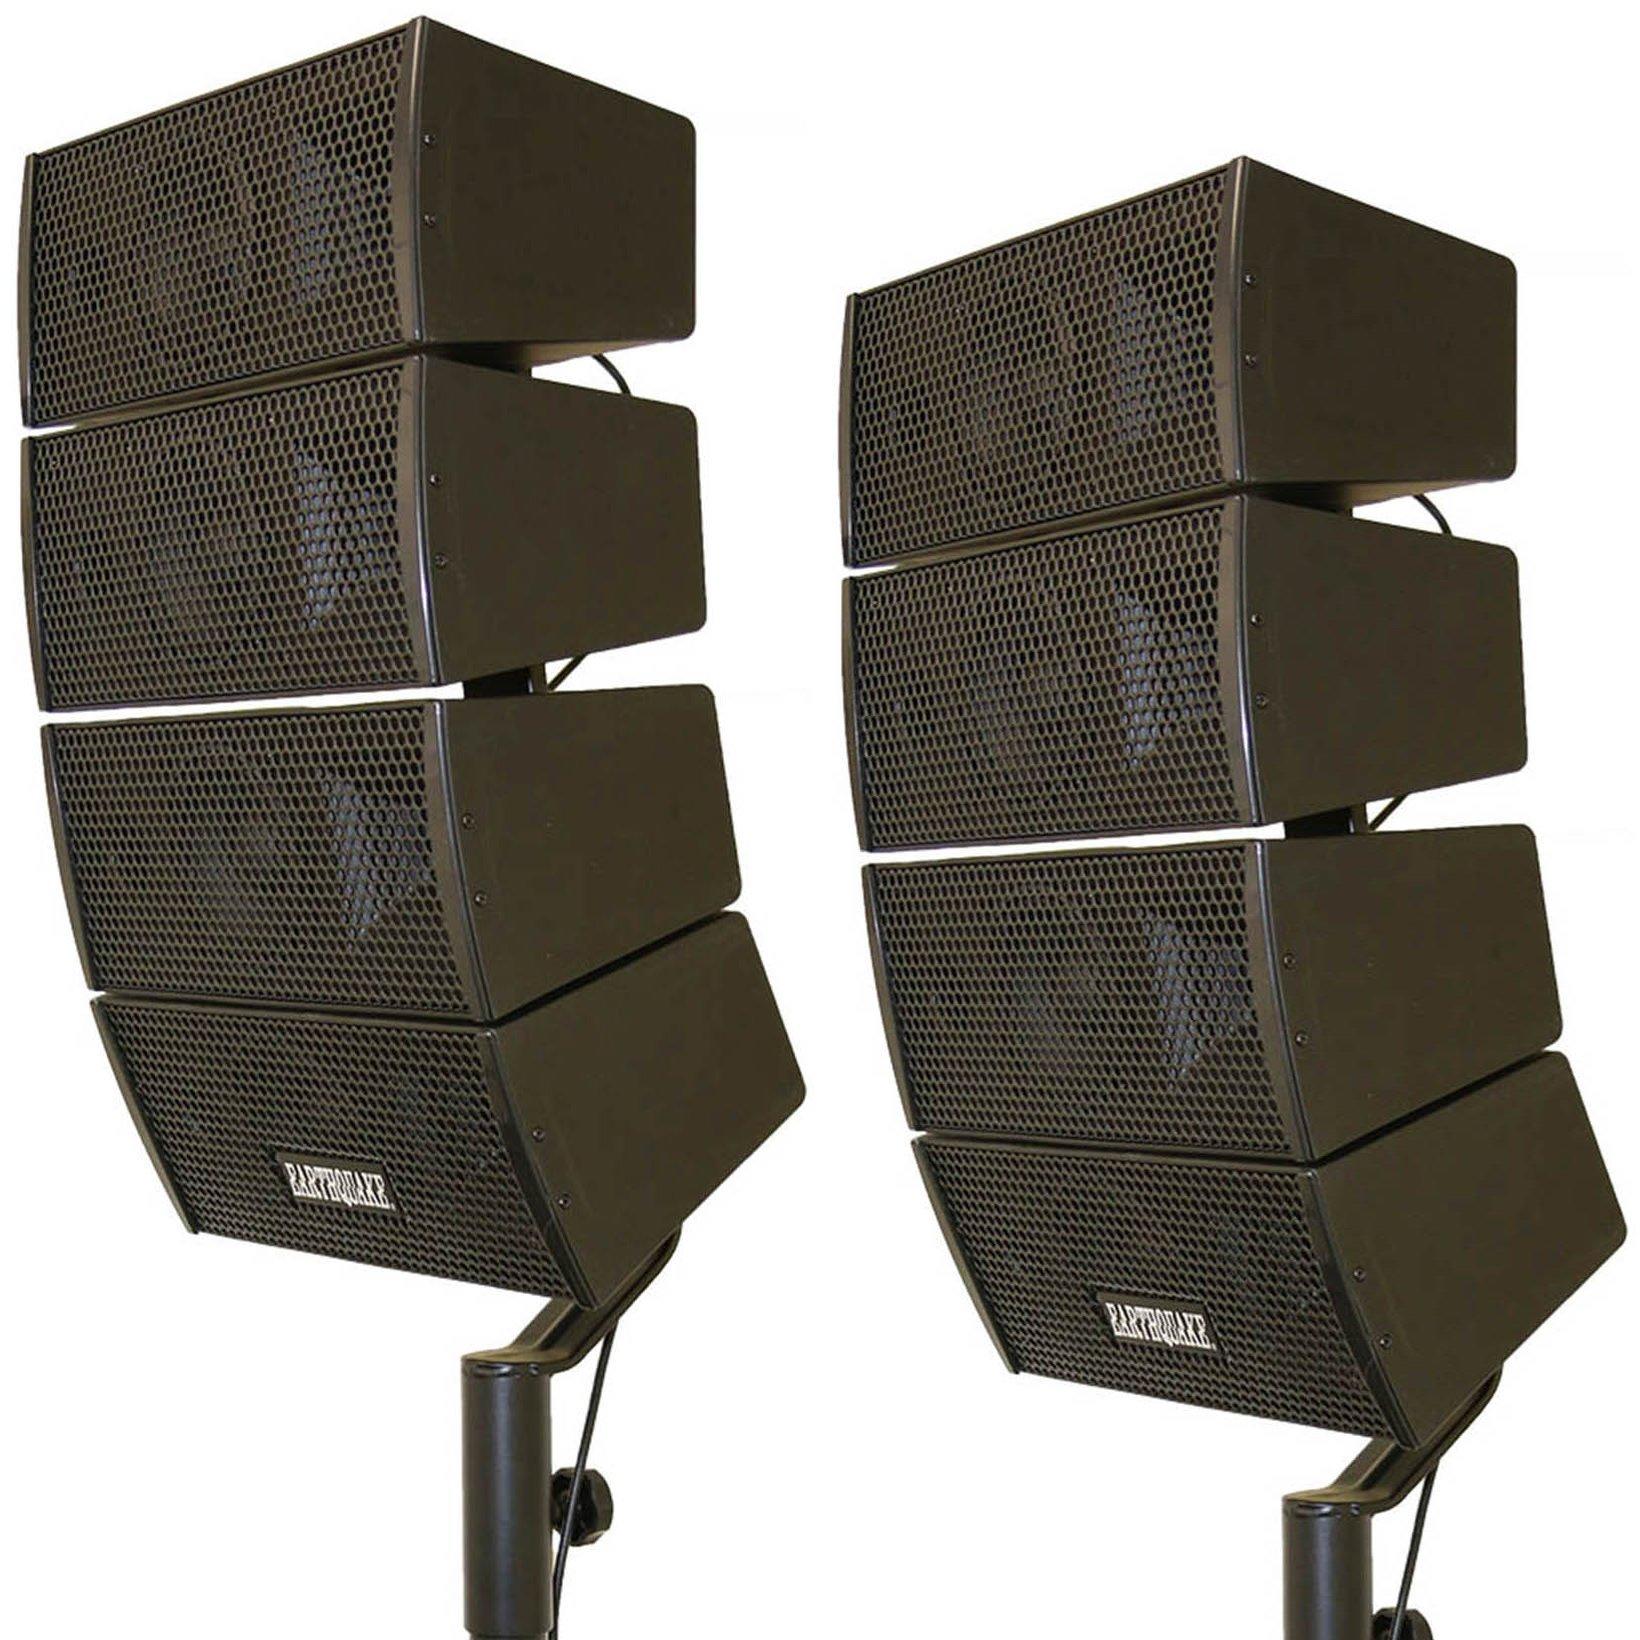 Earthquake Sound DJ-Quake 4x 4-inch Array Speakers, Set of 2 by Earthquake Sound